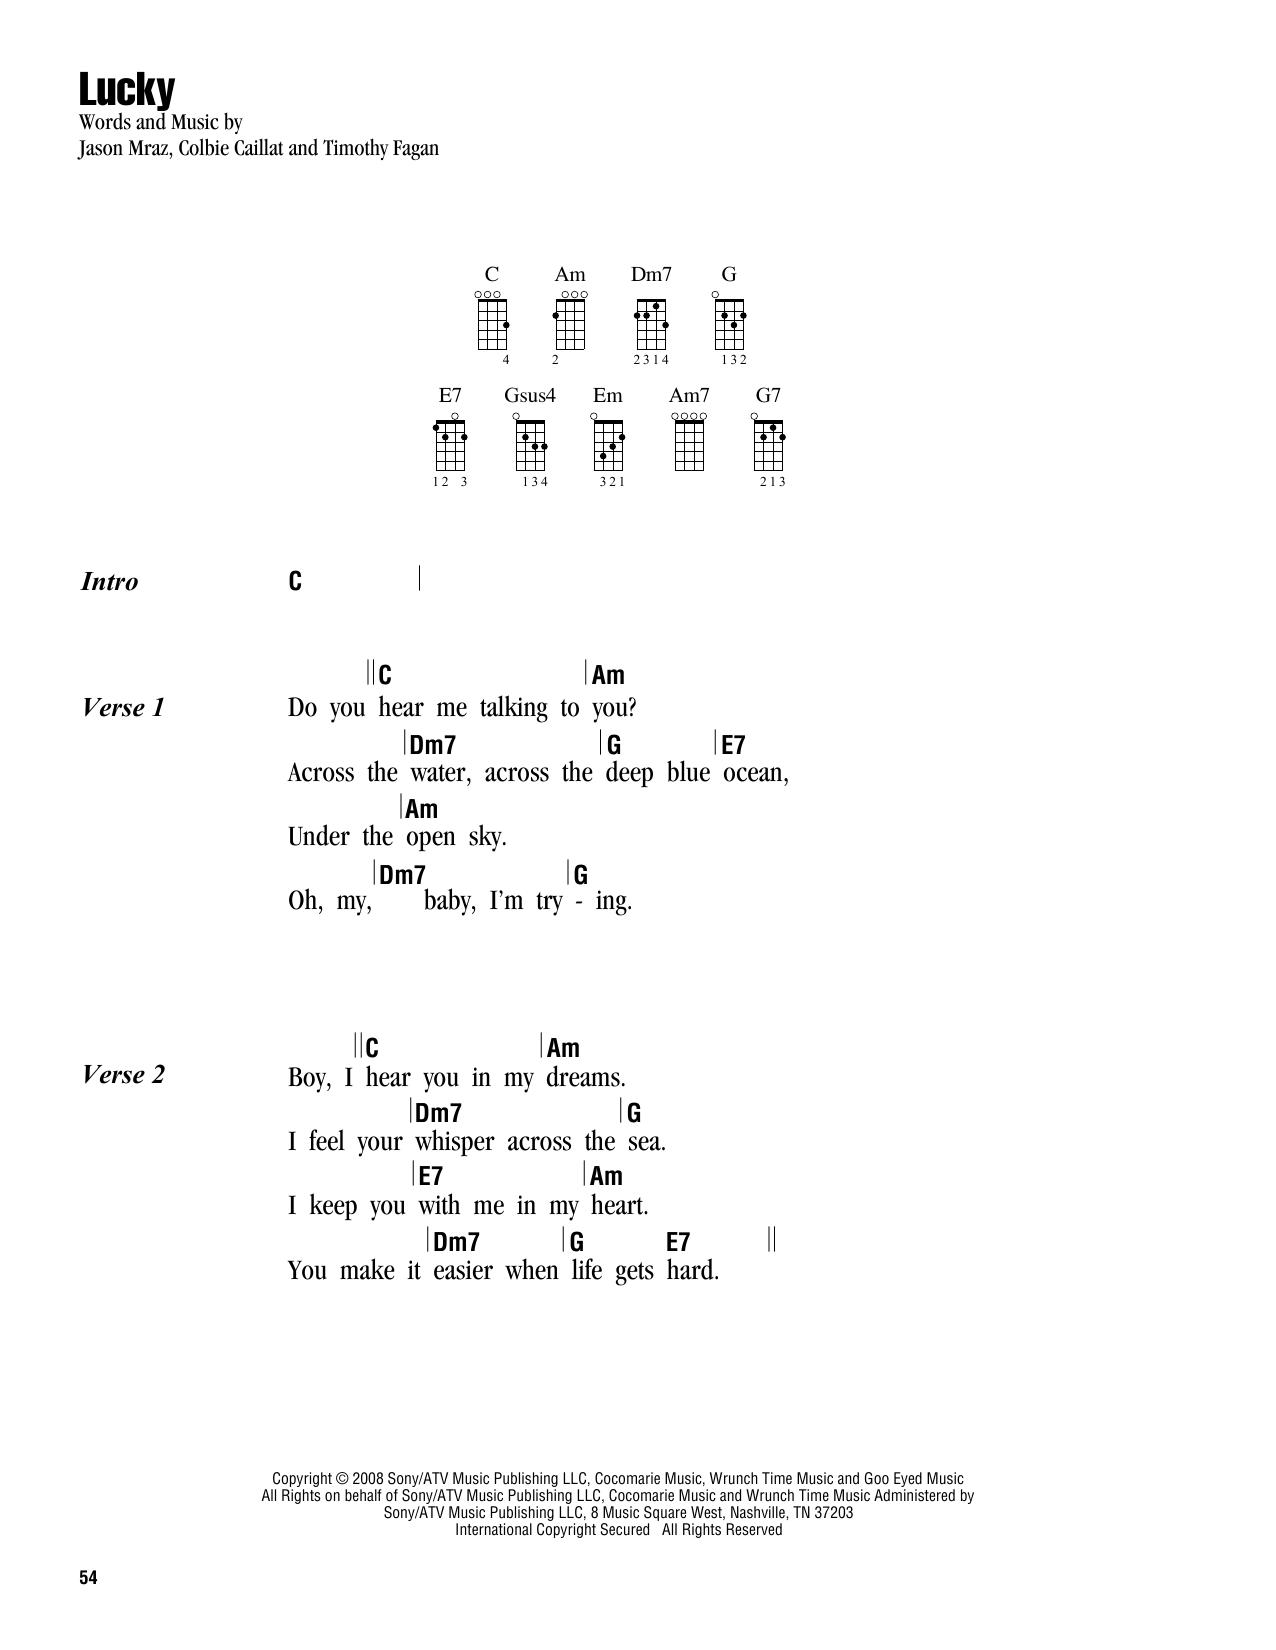 Jason Mraz Colbie Caillat Lucky Sheet Music Notes Chords